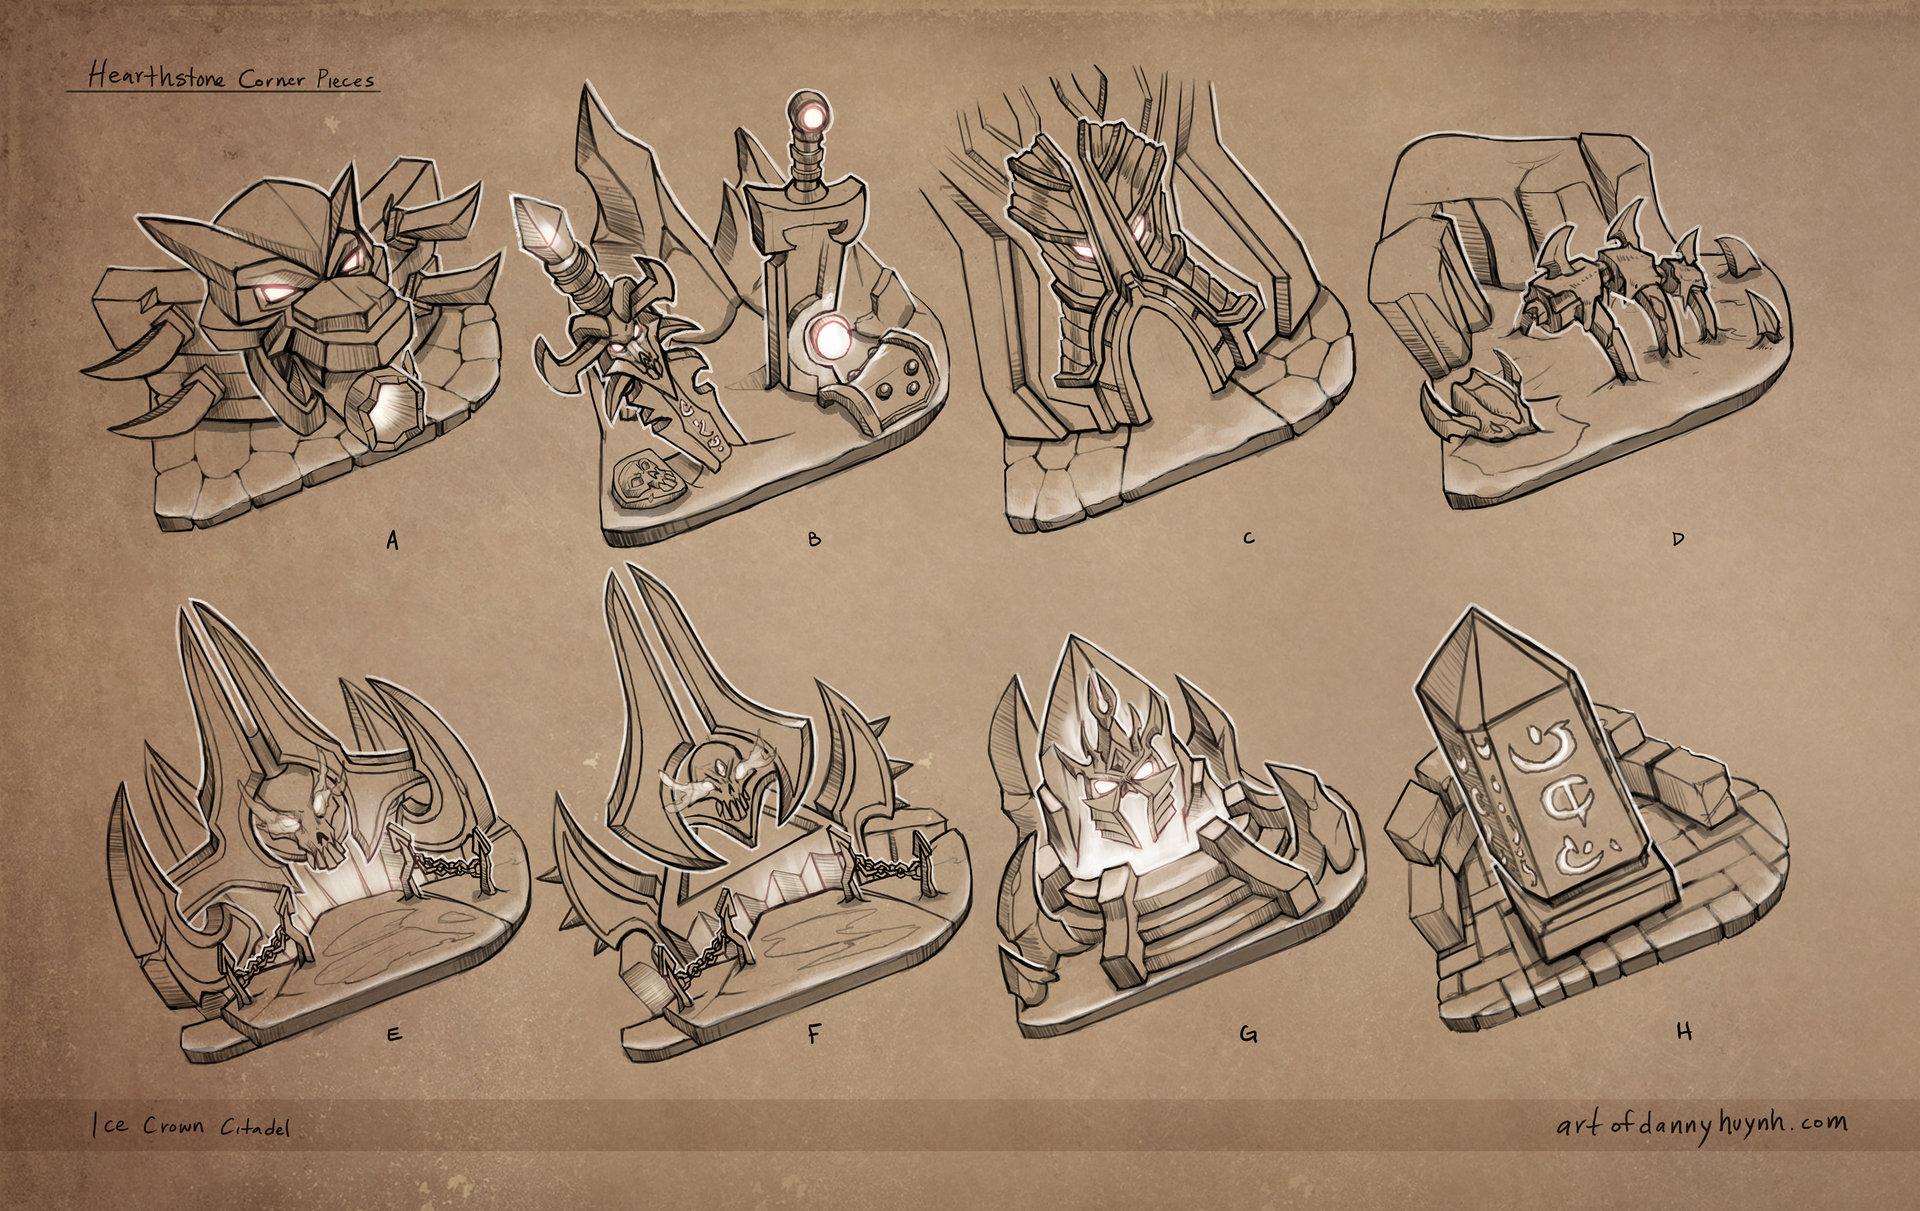 Concepts of cornerstones for Ice Crown Citadel.